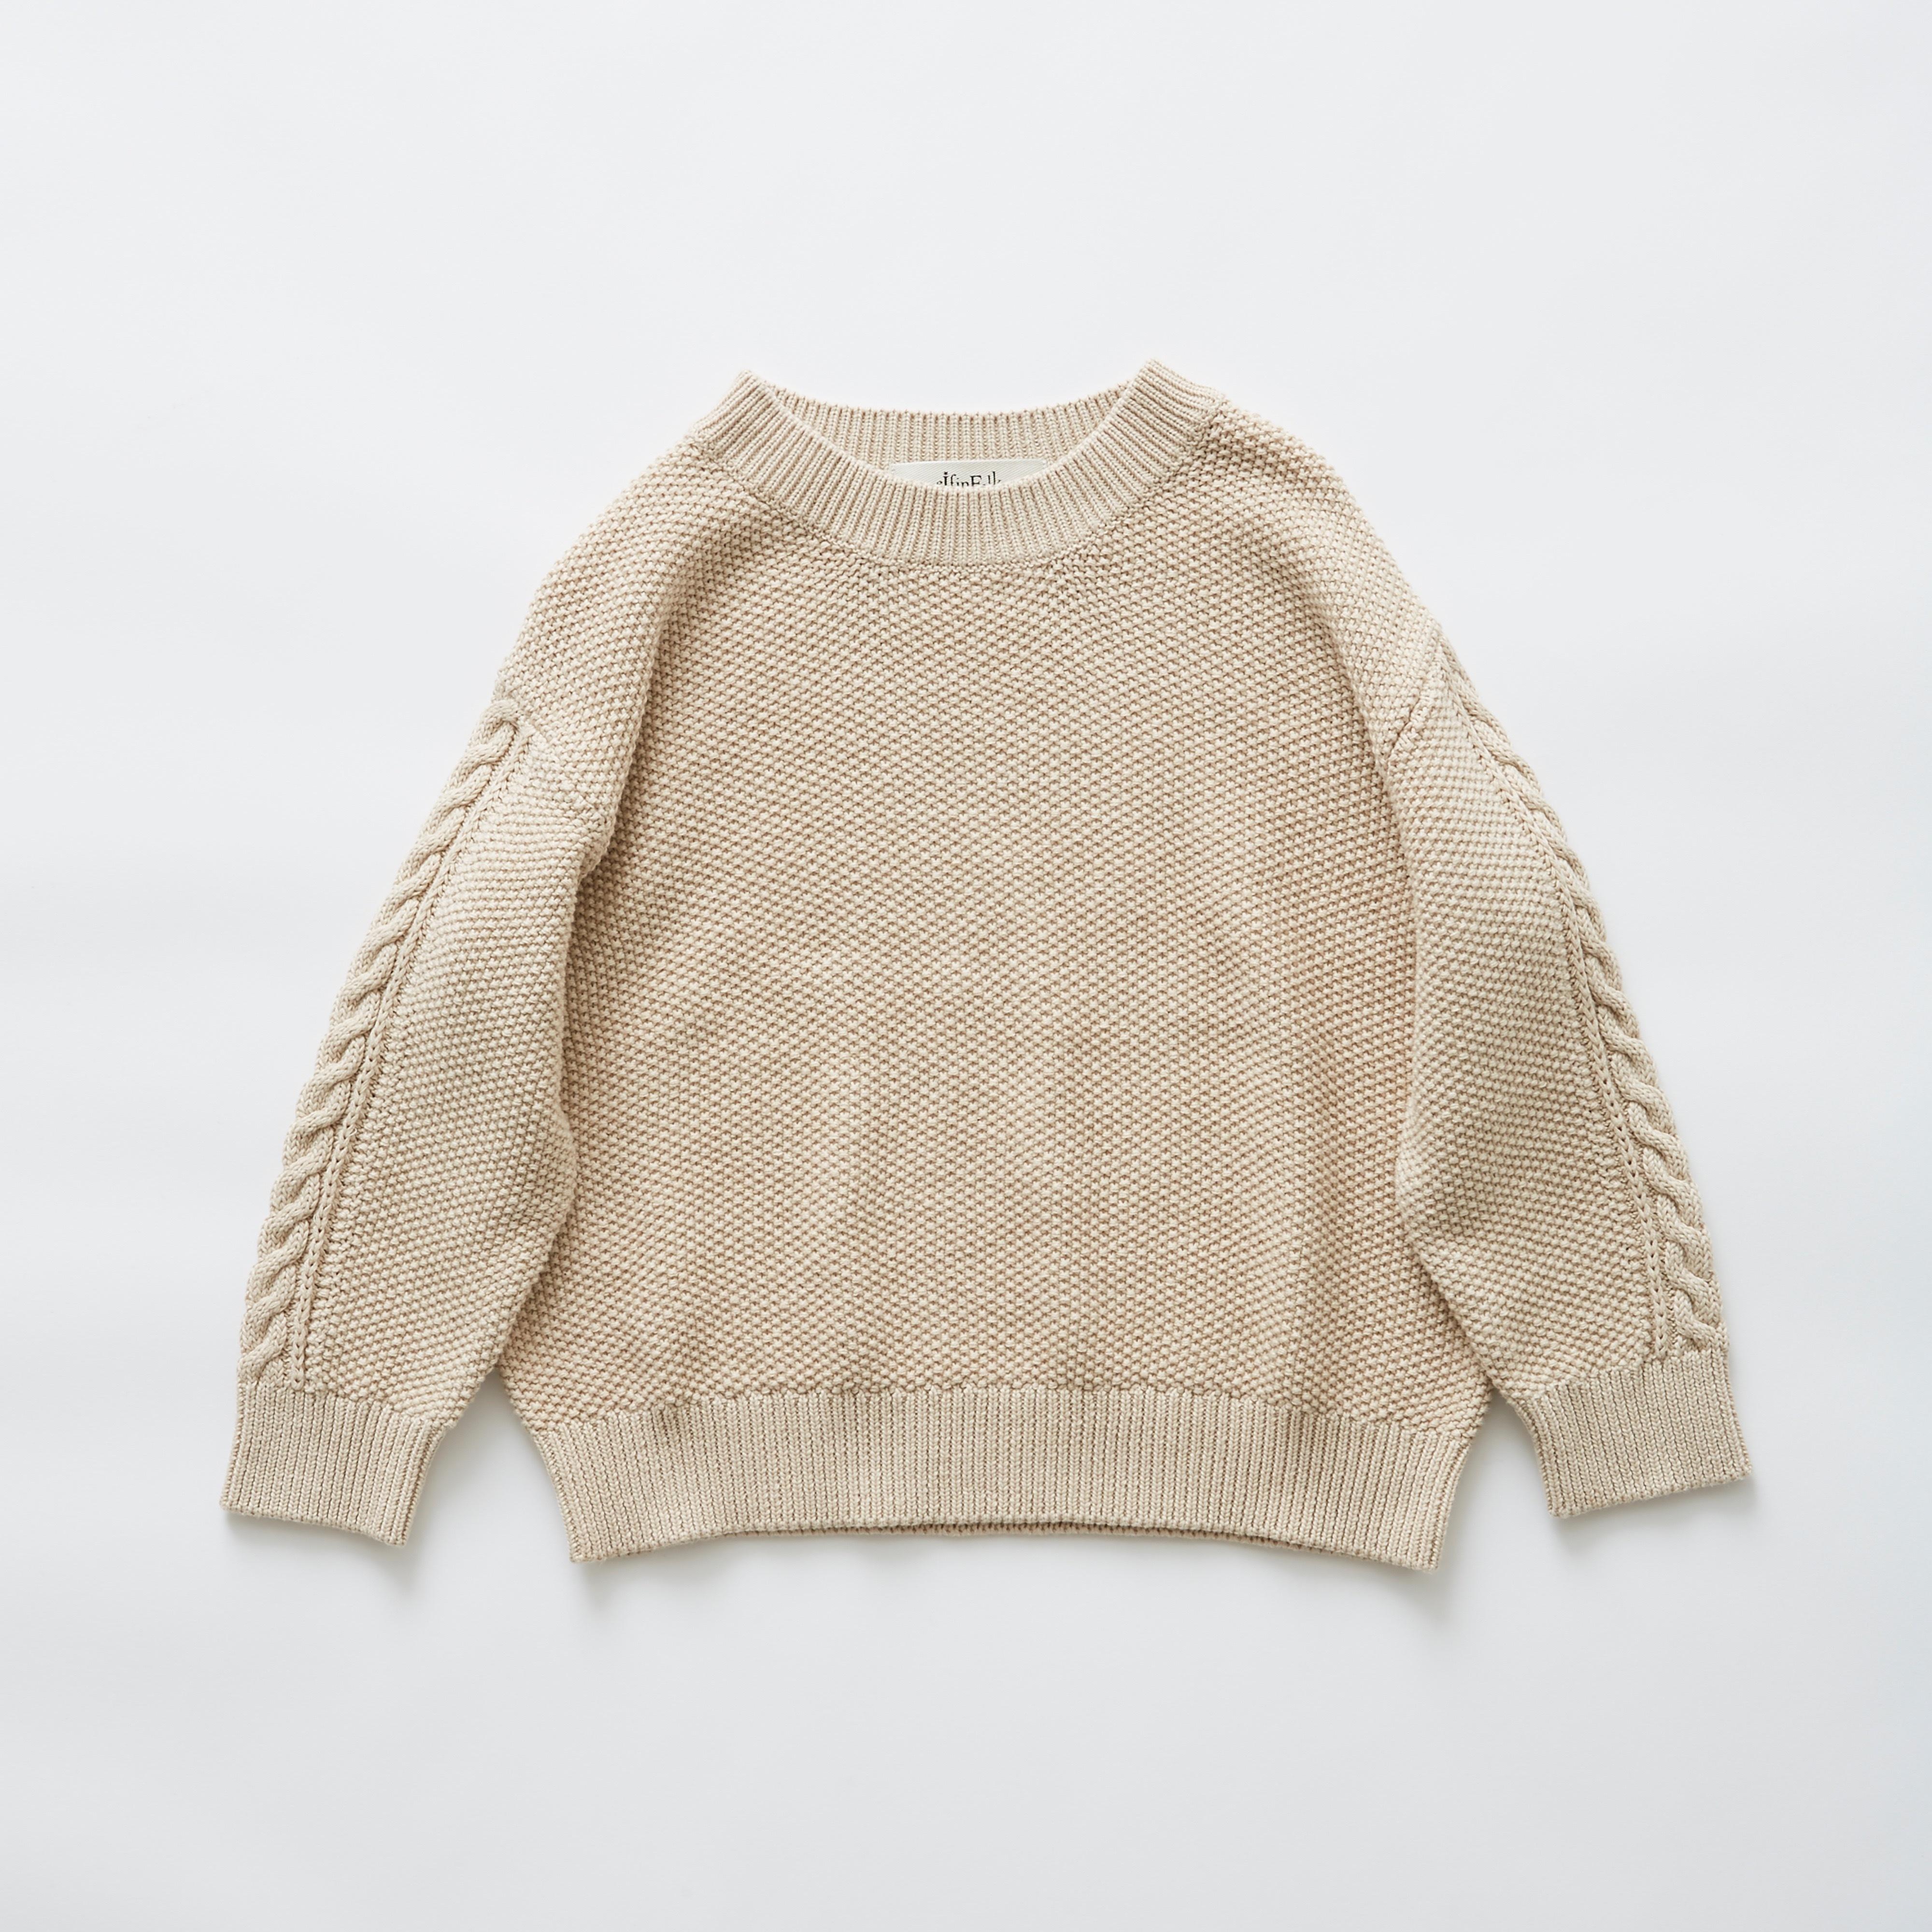 《eLfinFolk 2019SS》moss stitch sweater / ivory / F(大人)